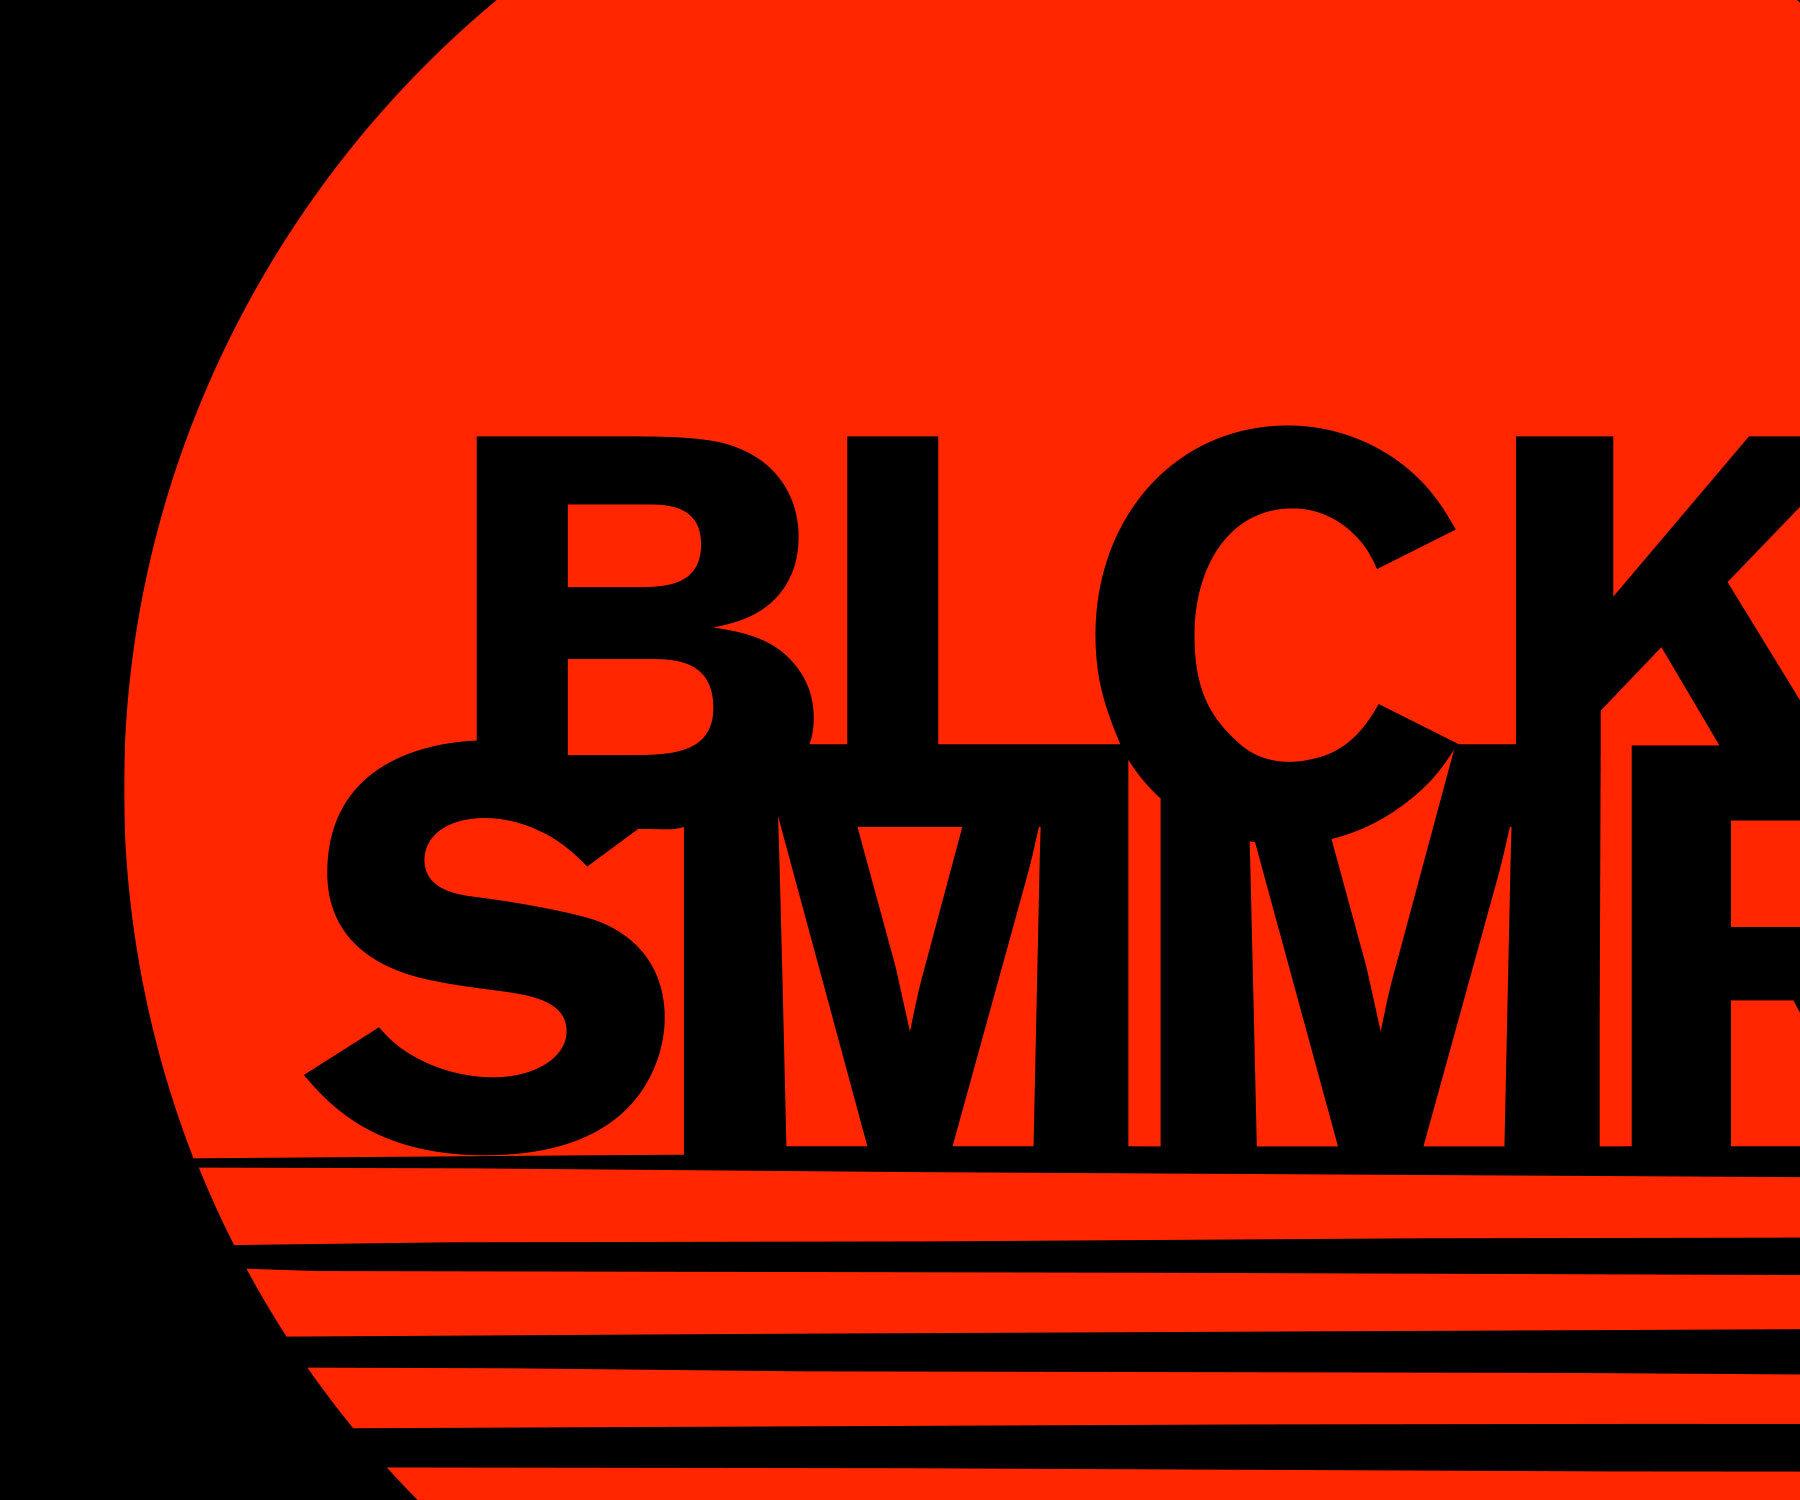 blcksmmr-closeup.jpg